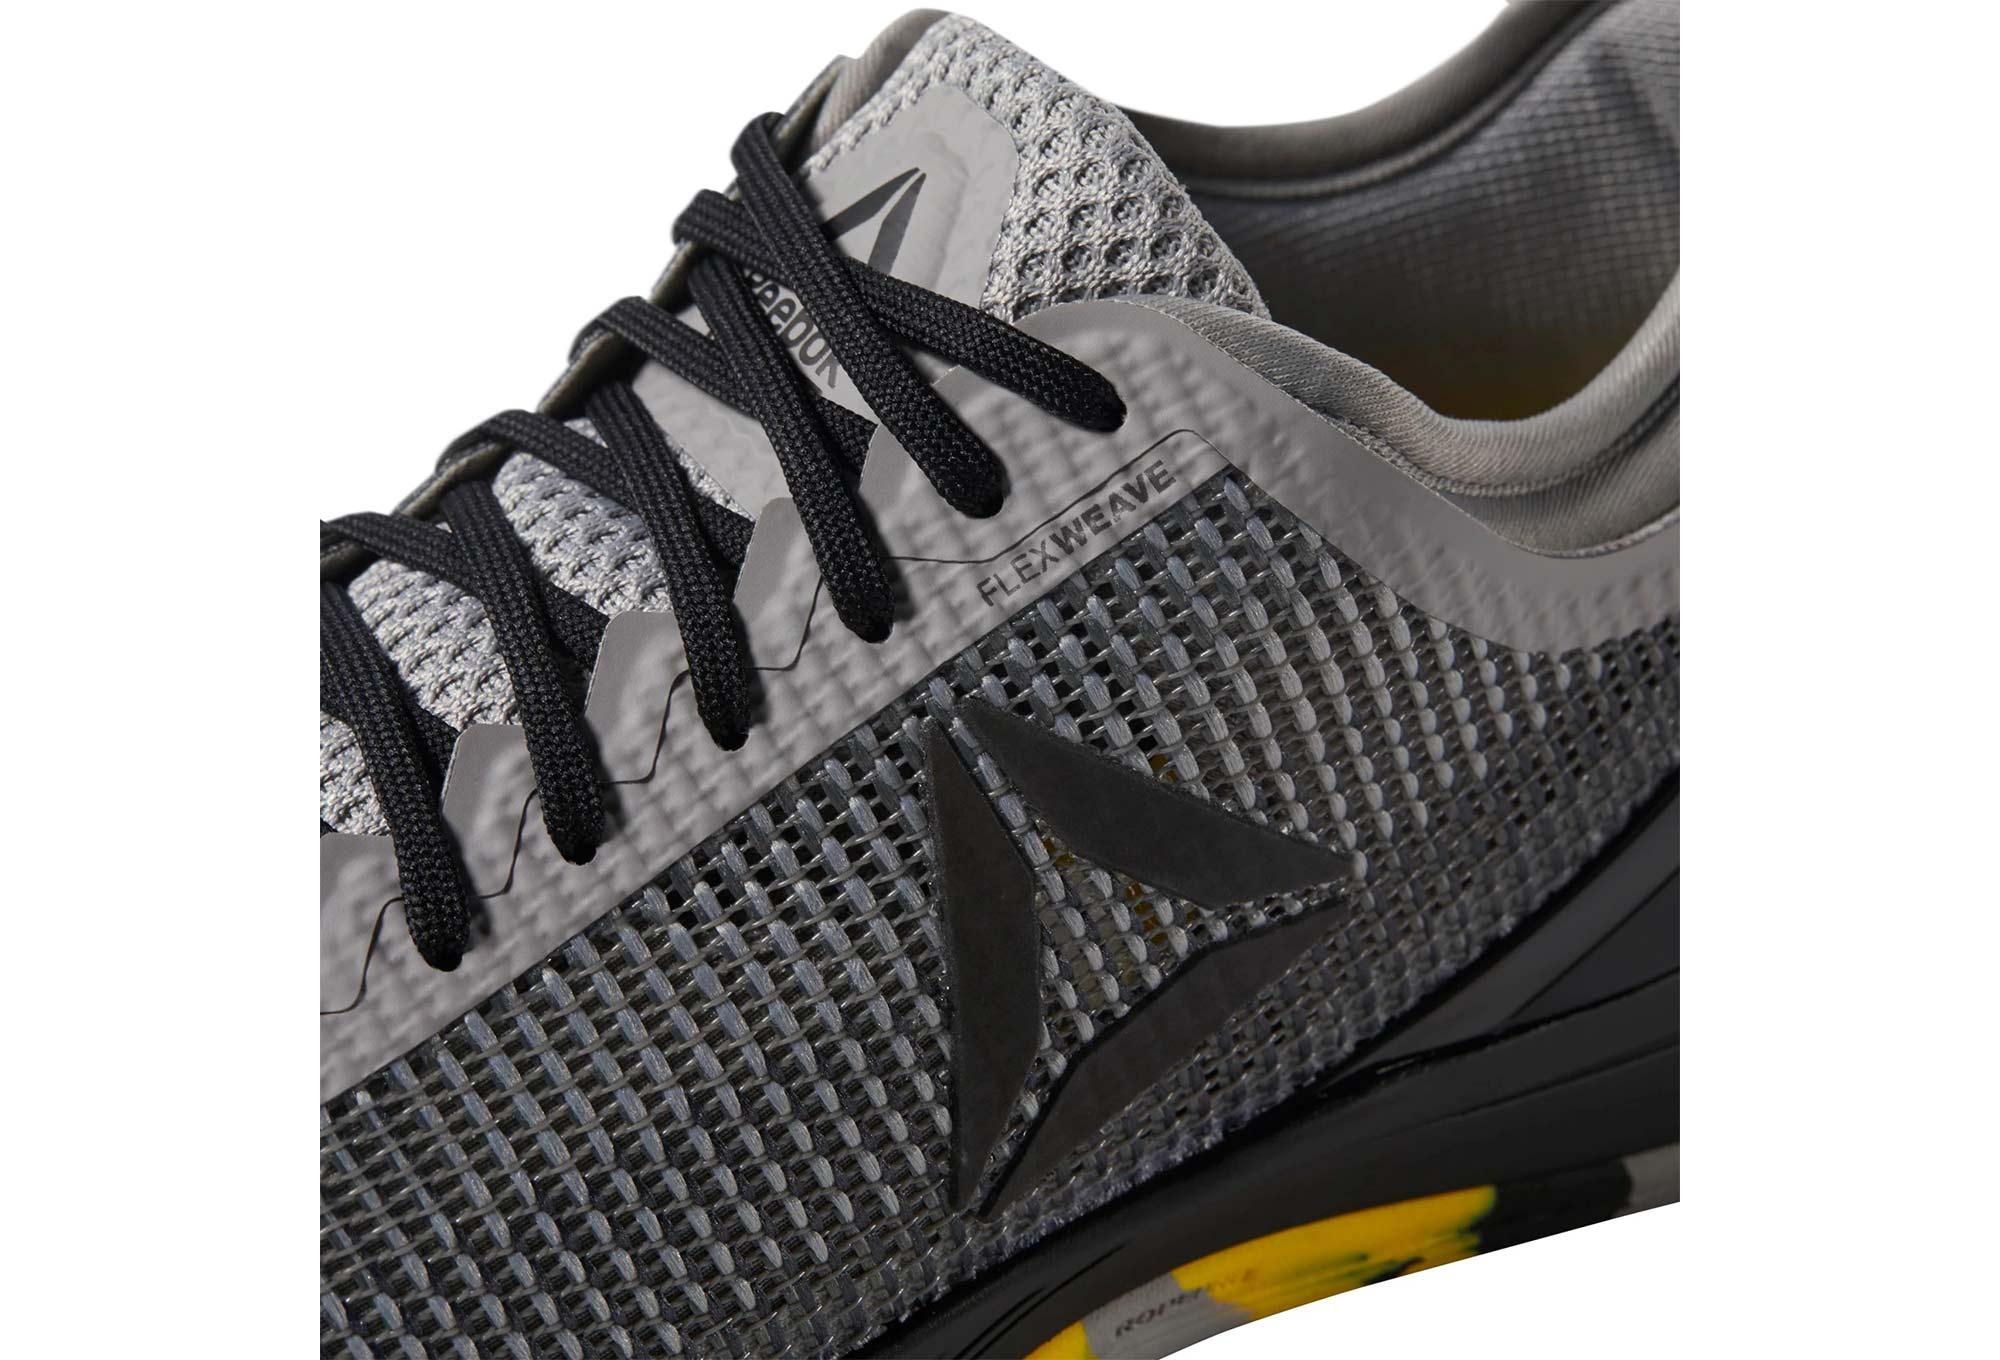 Reebok CrossFit Nano 8 Flexweave Grey Black Yellow